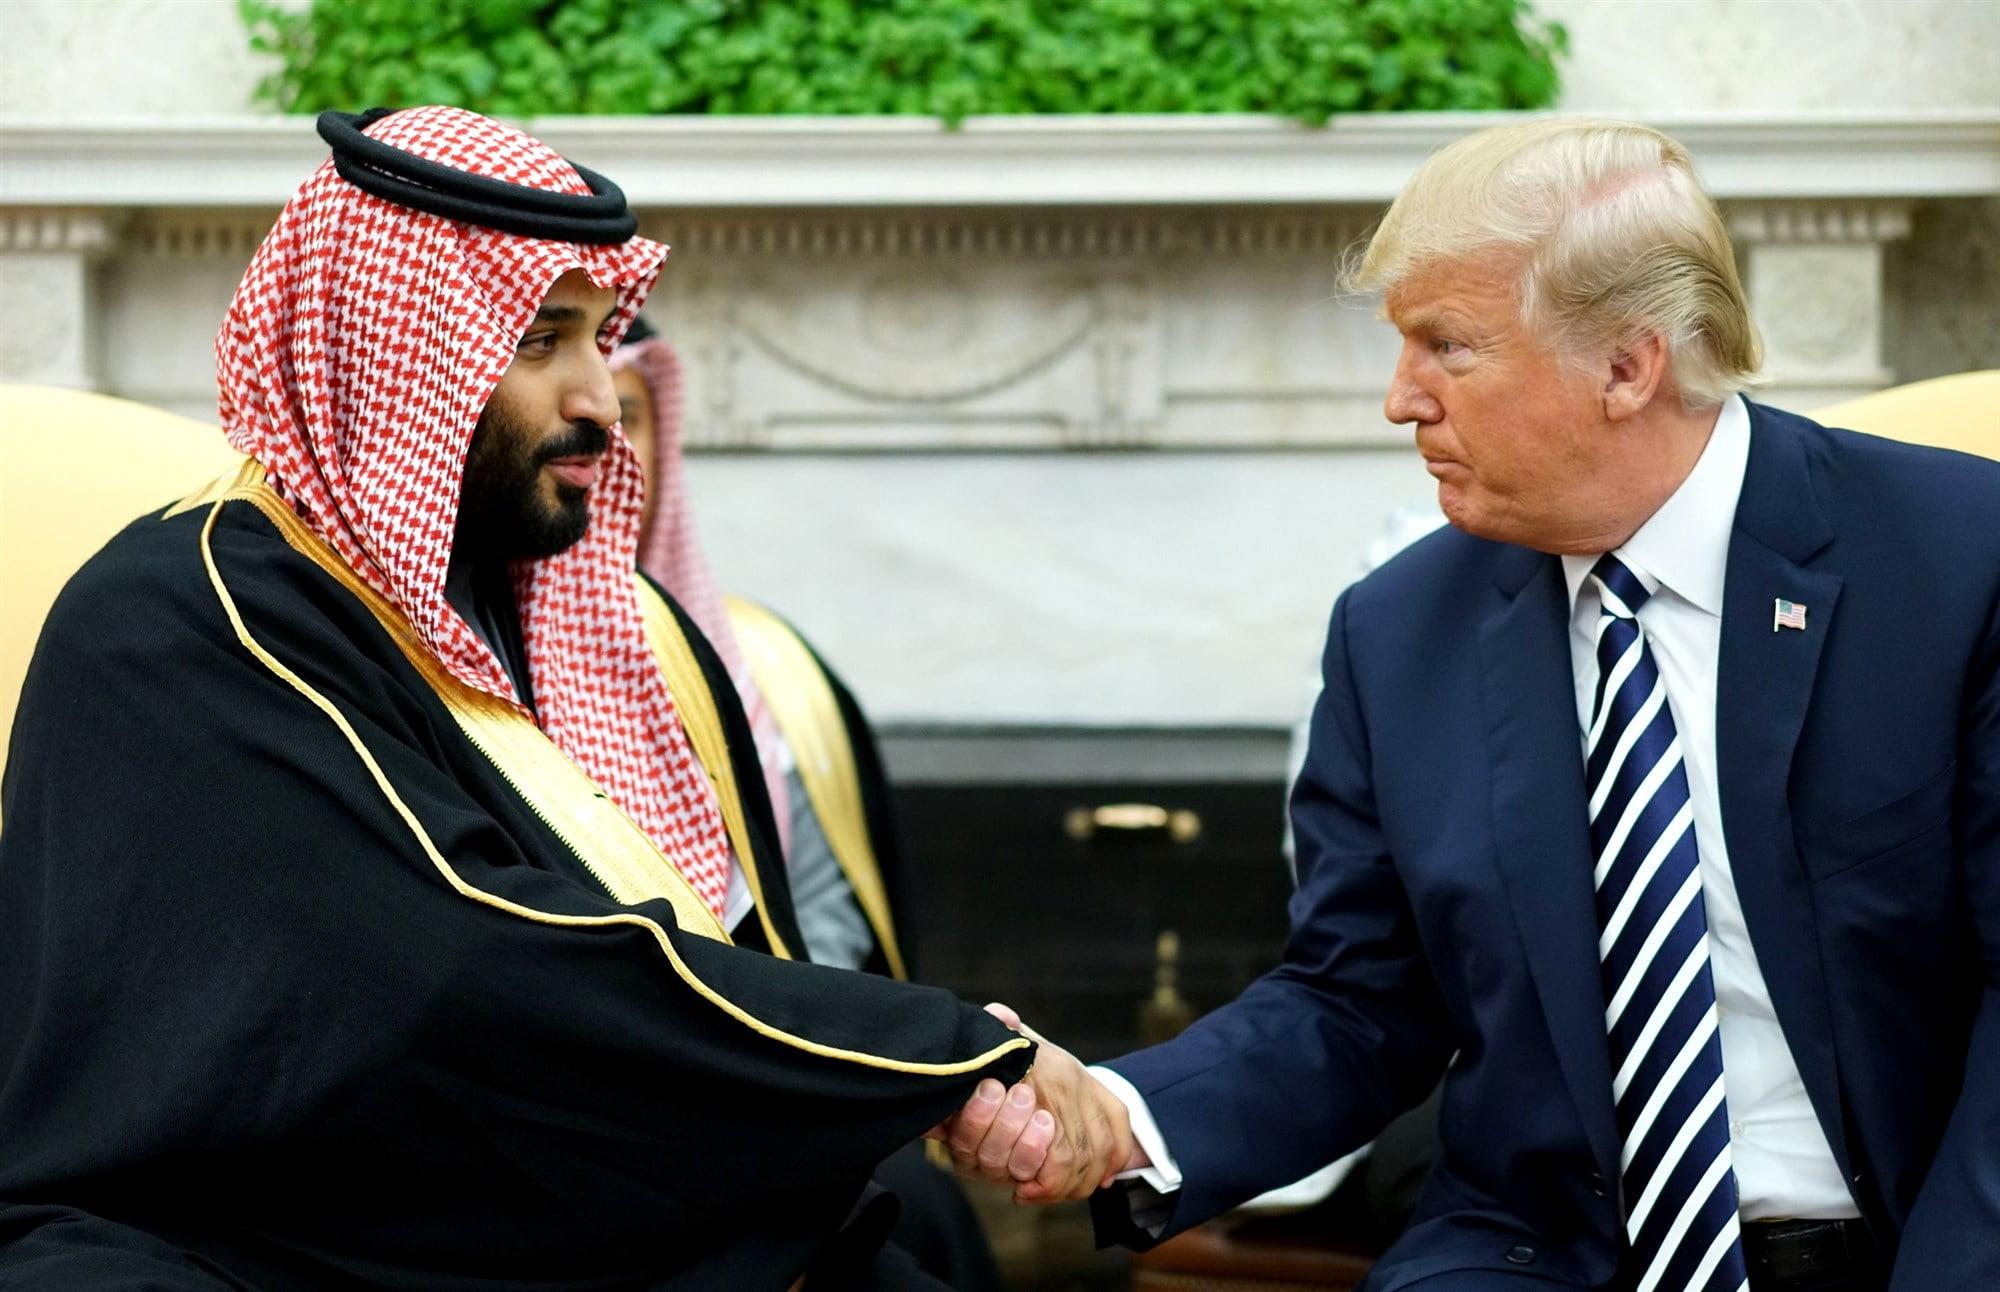 181211 donald trump mohammed bin salman cs 509p 1dd20bf36279d7c60140ce548c8d34ab.fit 2000w - Human Rights Group Slams Saudi Arabia for Crackdown on Dissent